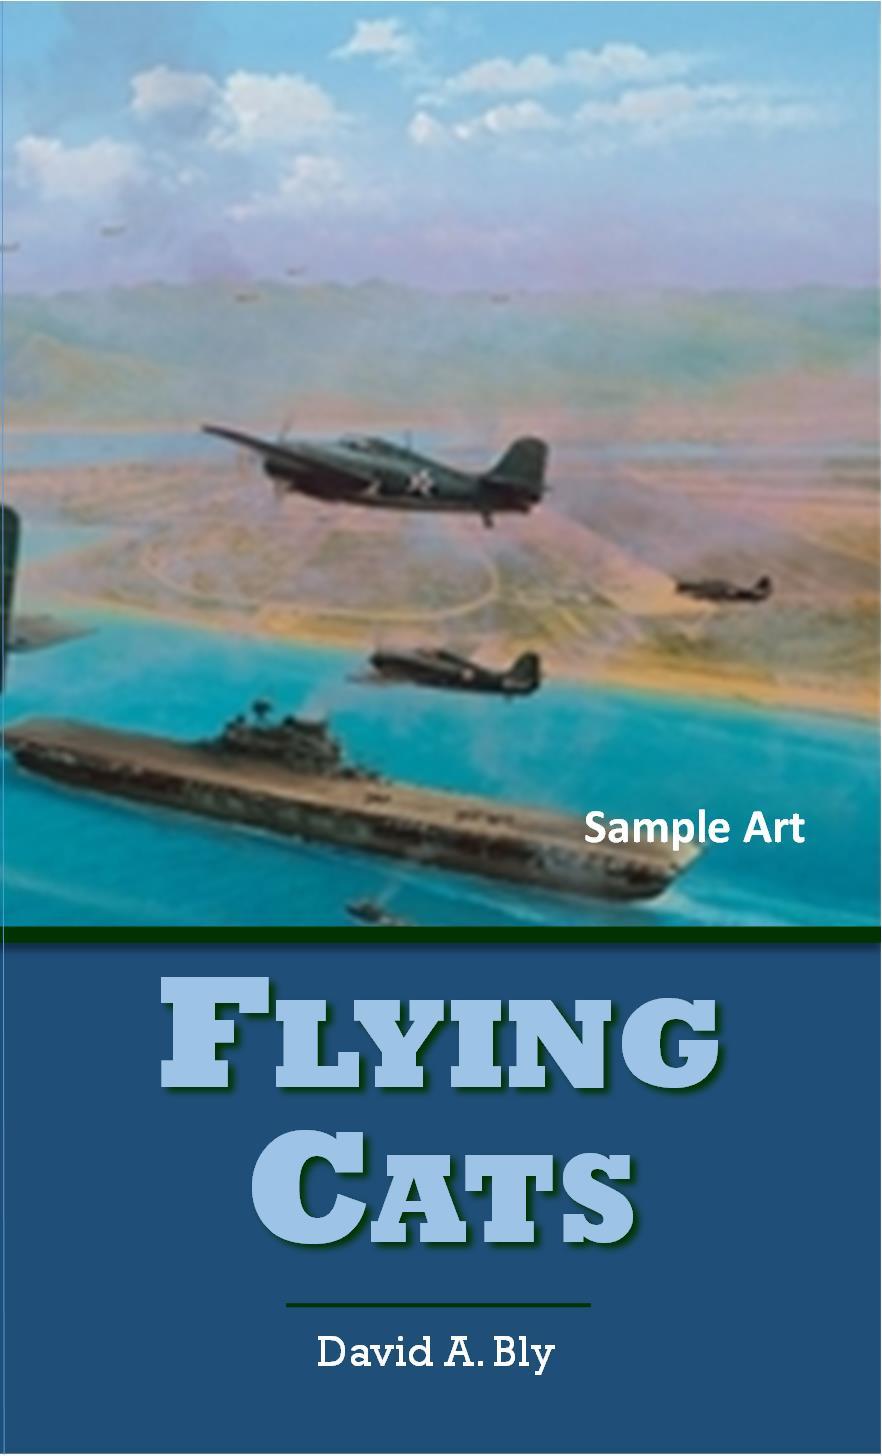 FlyingCatsFrontCover_170215.jpg